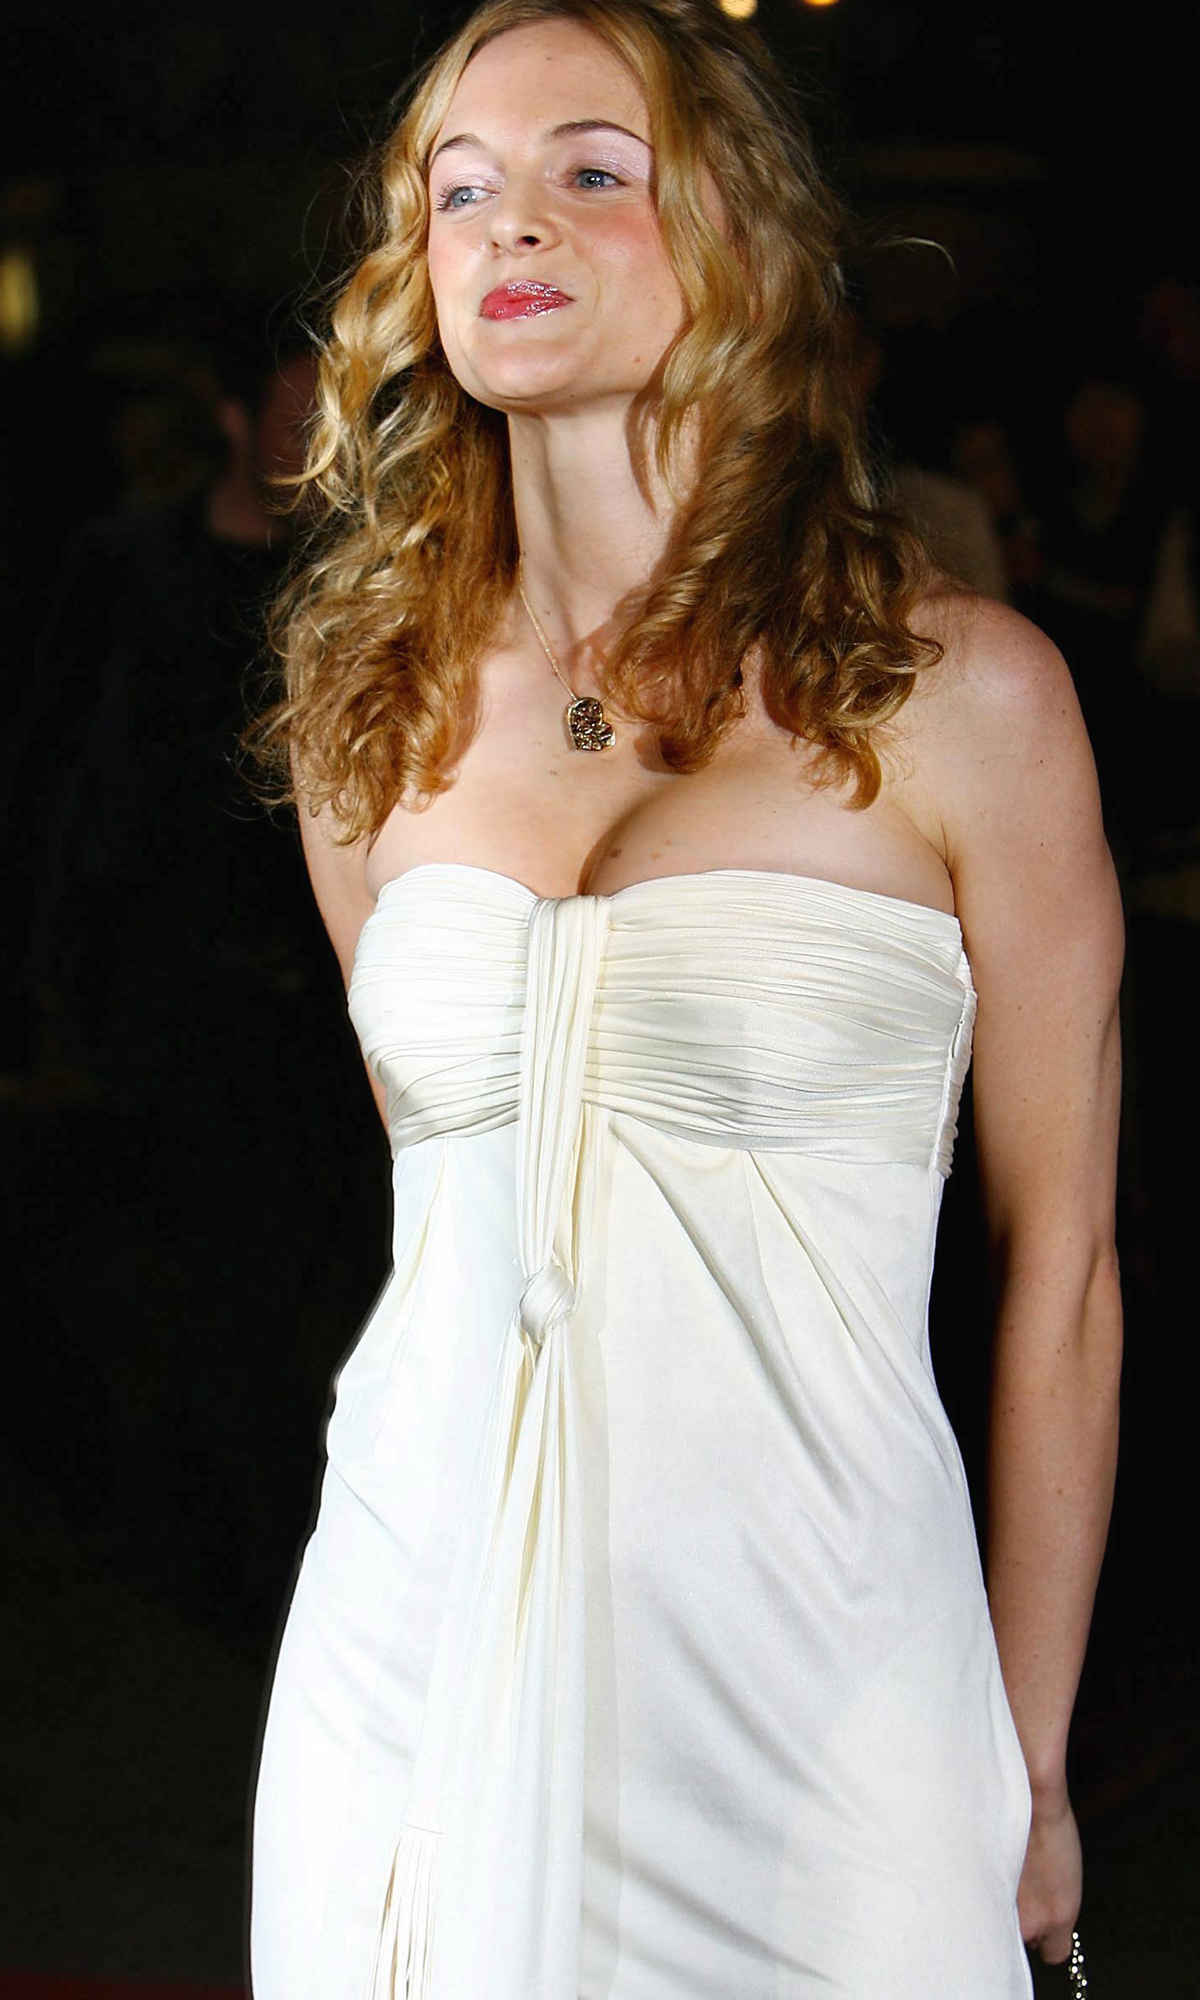 Amerykańska aktorka Heather Graham